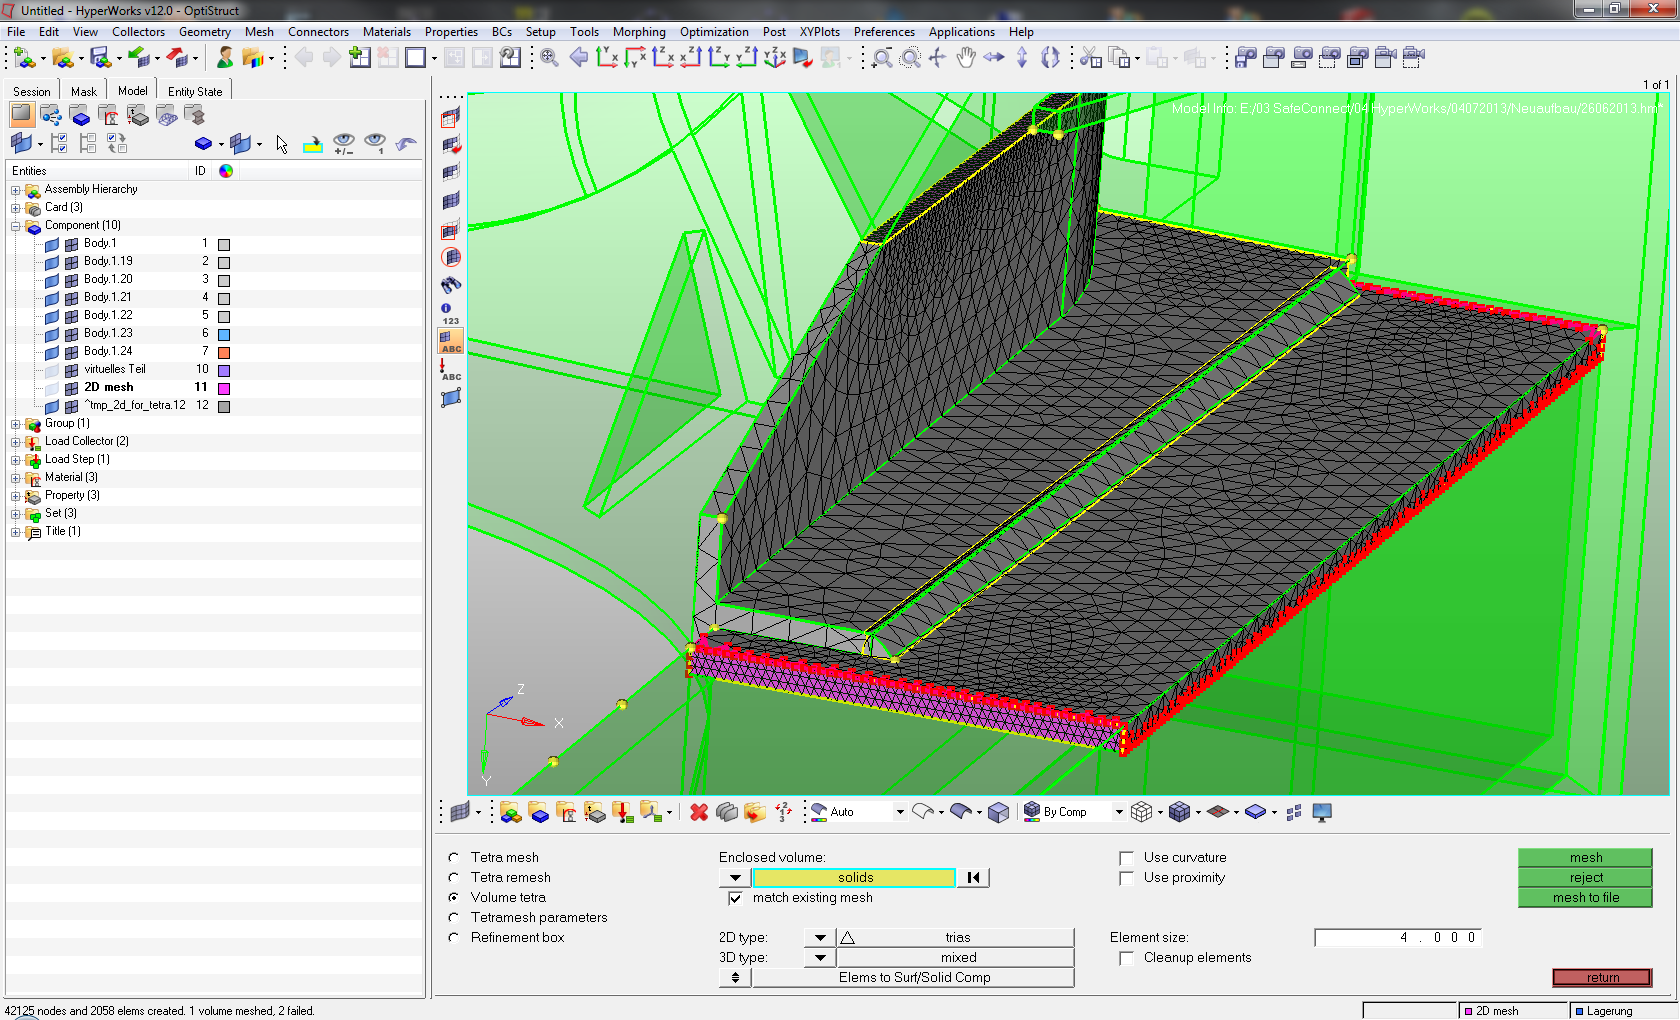 Ktm 250 Sxf Wiring Diagram 450 2015 Diagrams 2003 125 Sx 300 Exc